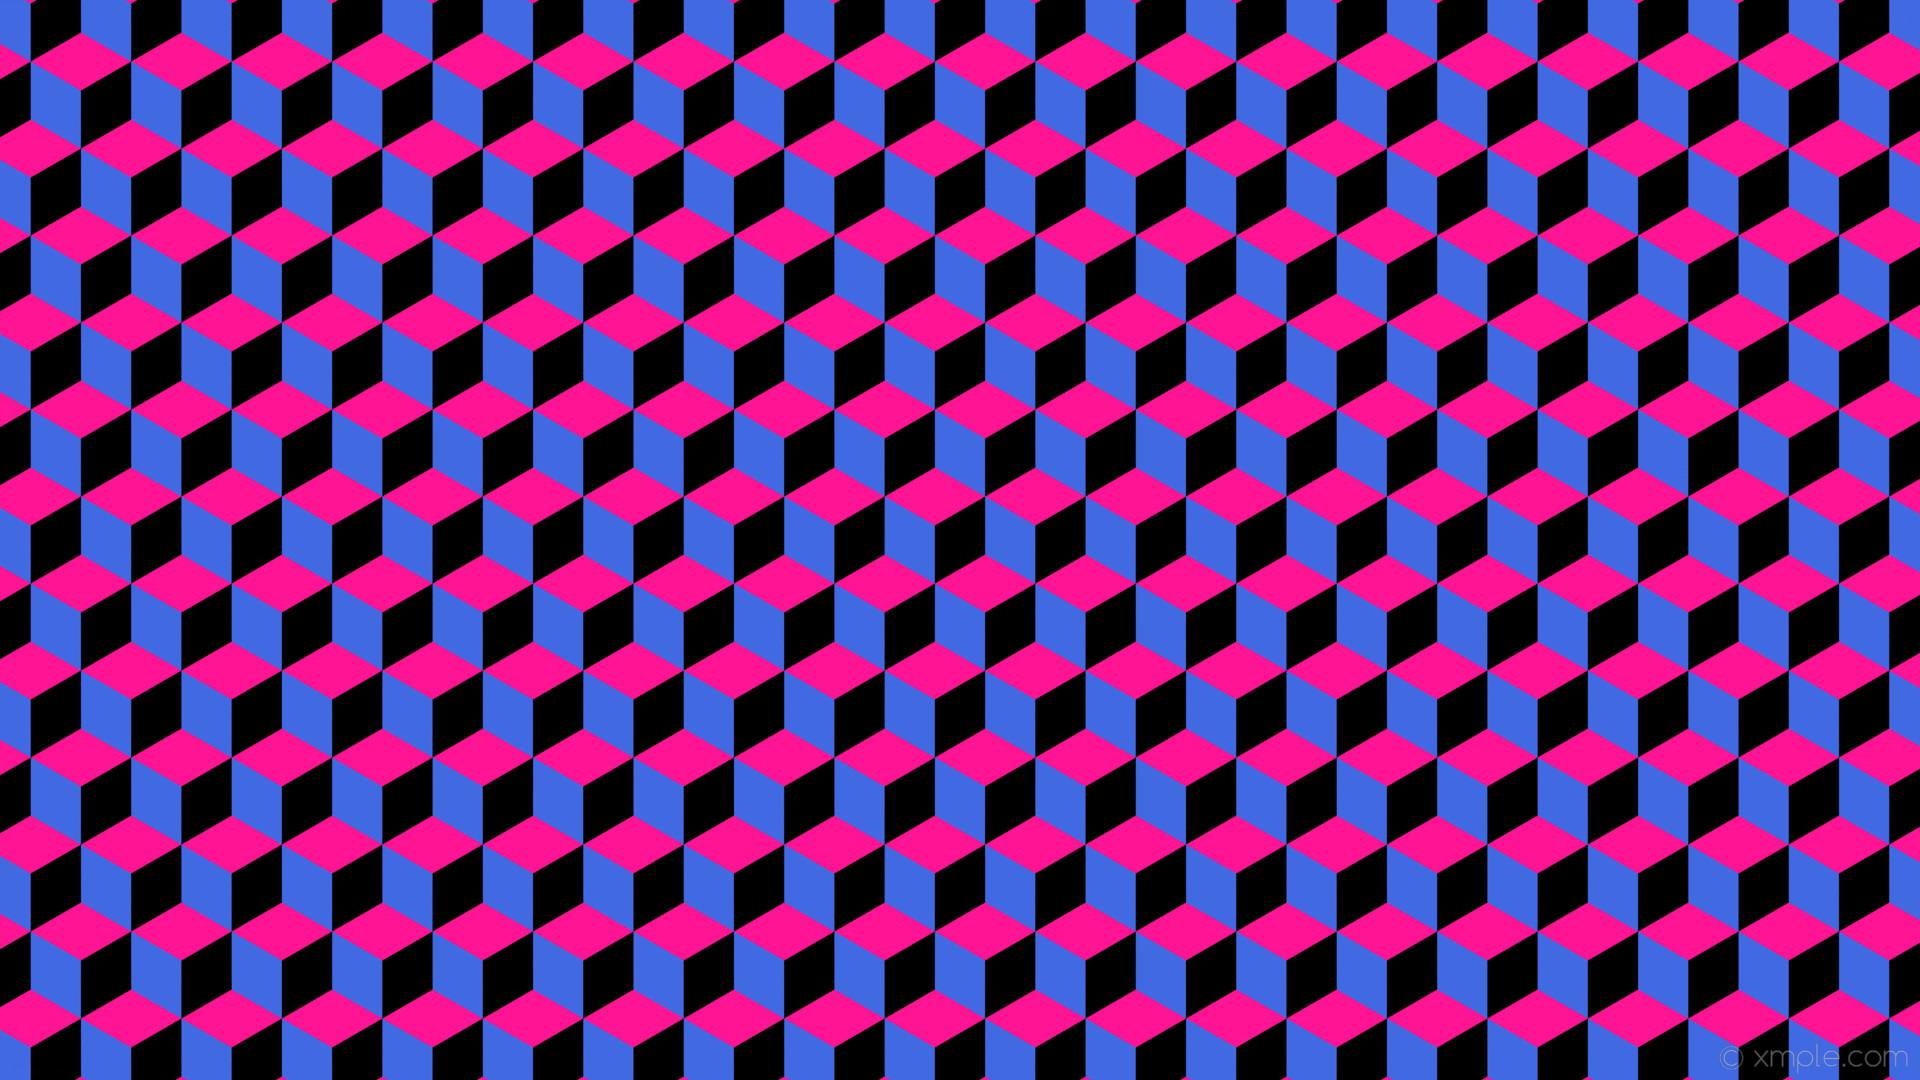 1920x1080 Wallpaper Purple Linear Blue Gradient Violet Royal Ee82ee 4169e1 60A